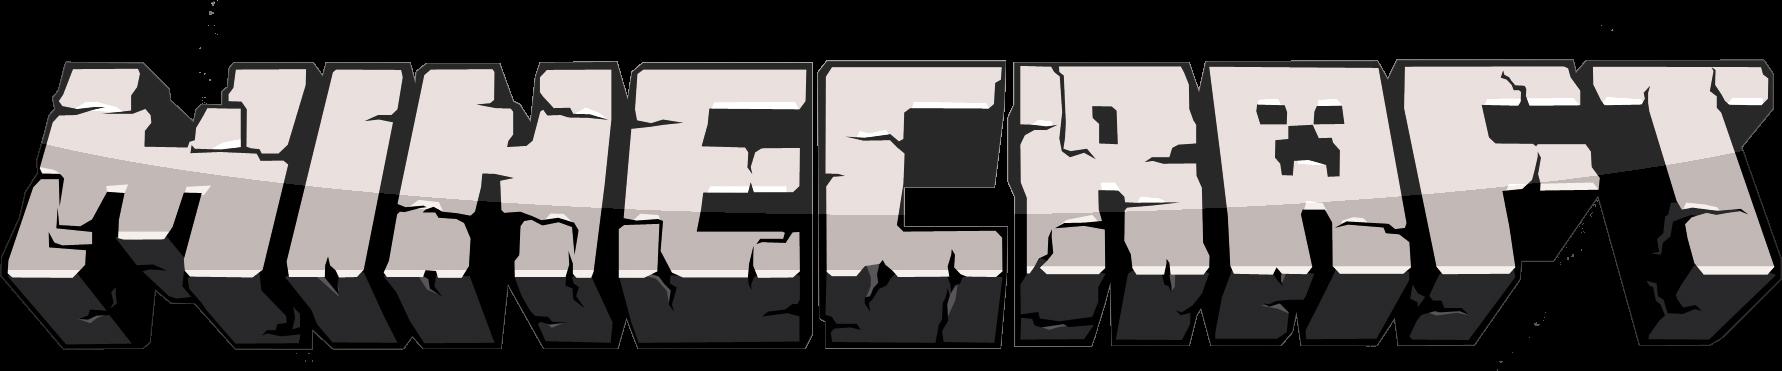 Minecraft Logo Free Transparent Png Logos